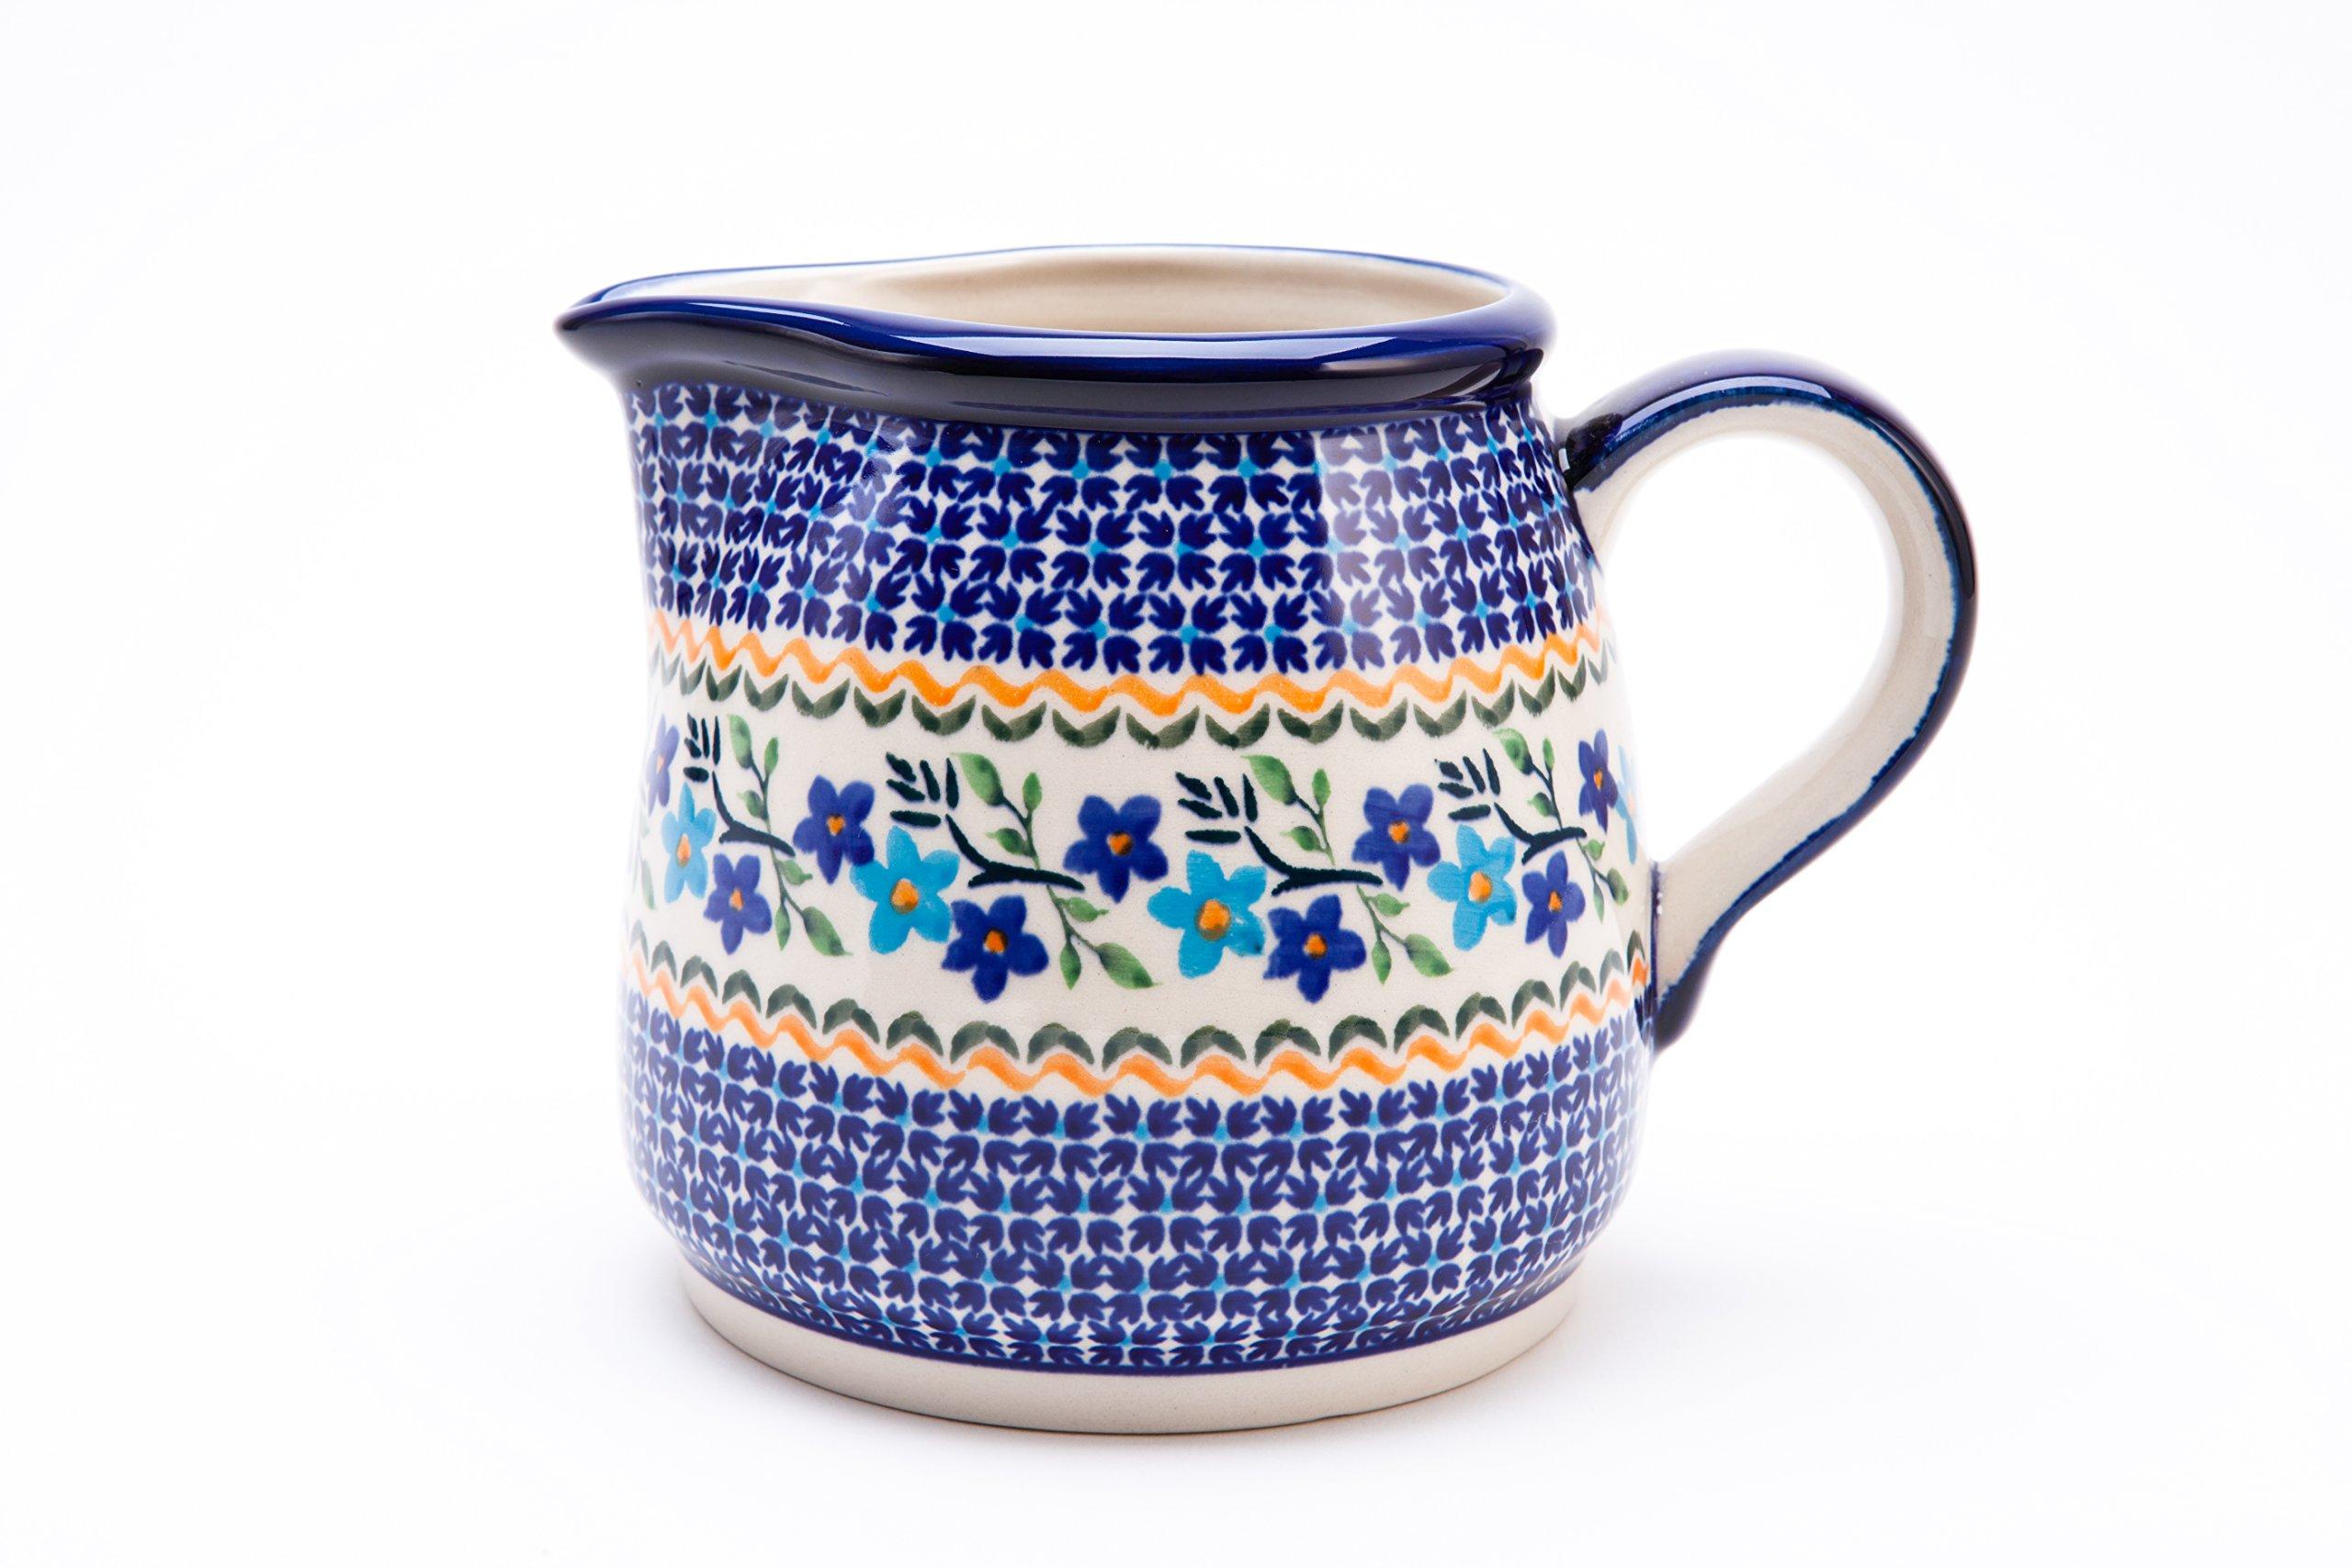 Hand-Decorated Polish Pottery Milk Jug/Water Carafe/Jug 1.2Litres Ø18,5cm, Height 13.5cm, Dekor 1154A